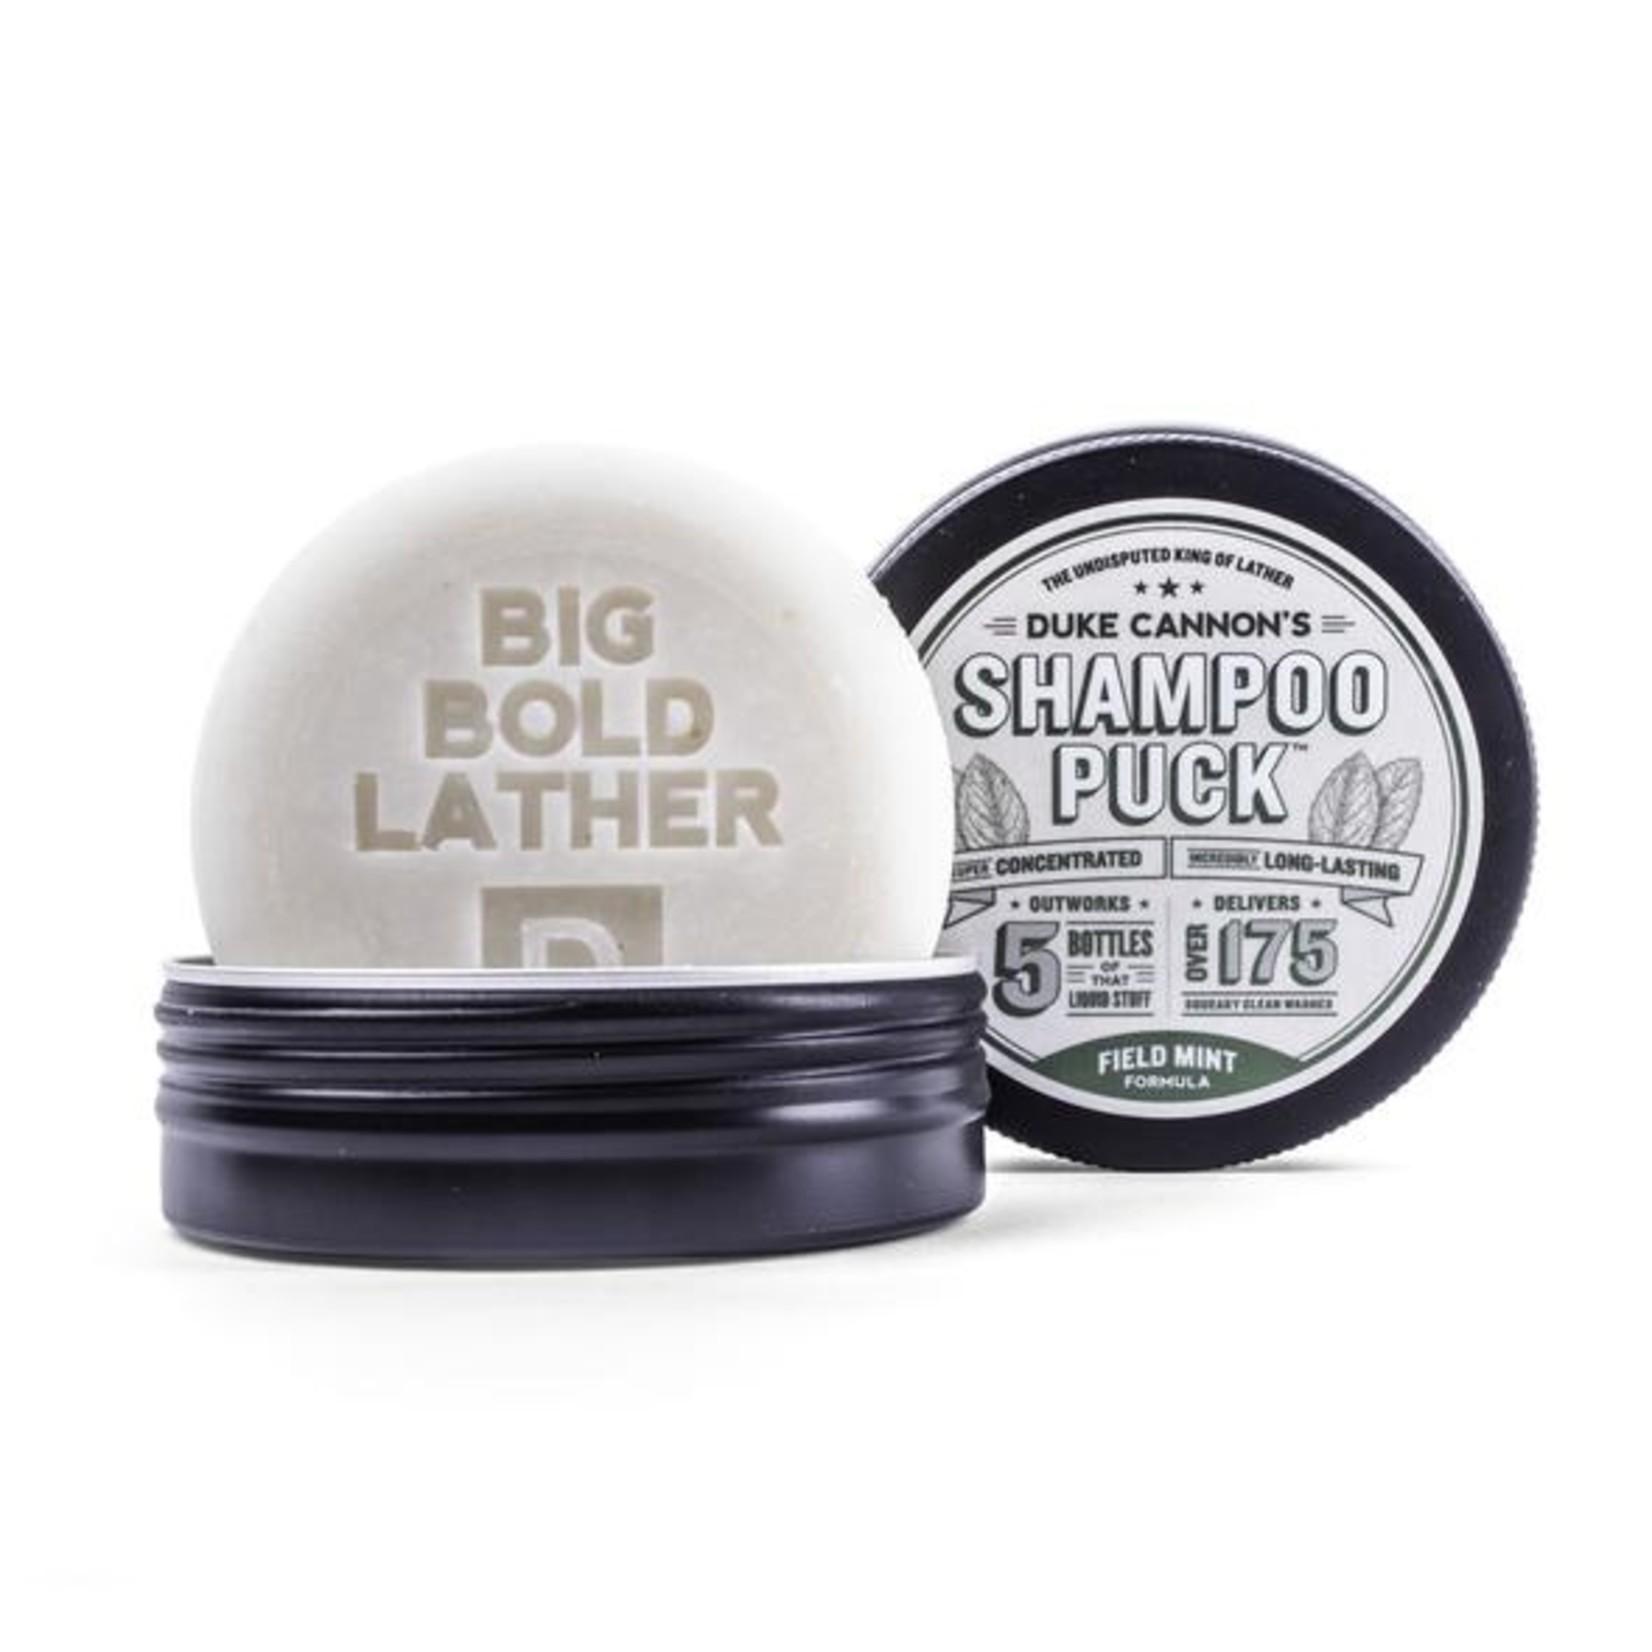 Duke Cannon Supply Co. Duke Cannon Shampoo Puck - 3 Scents